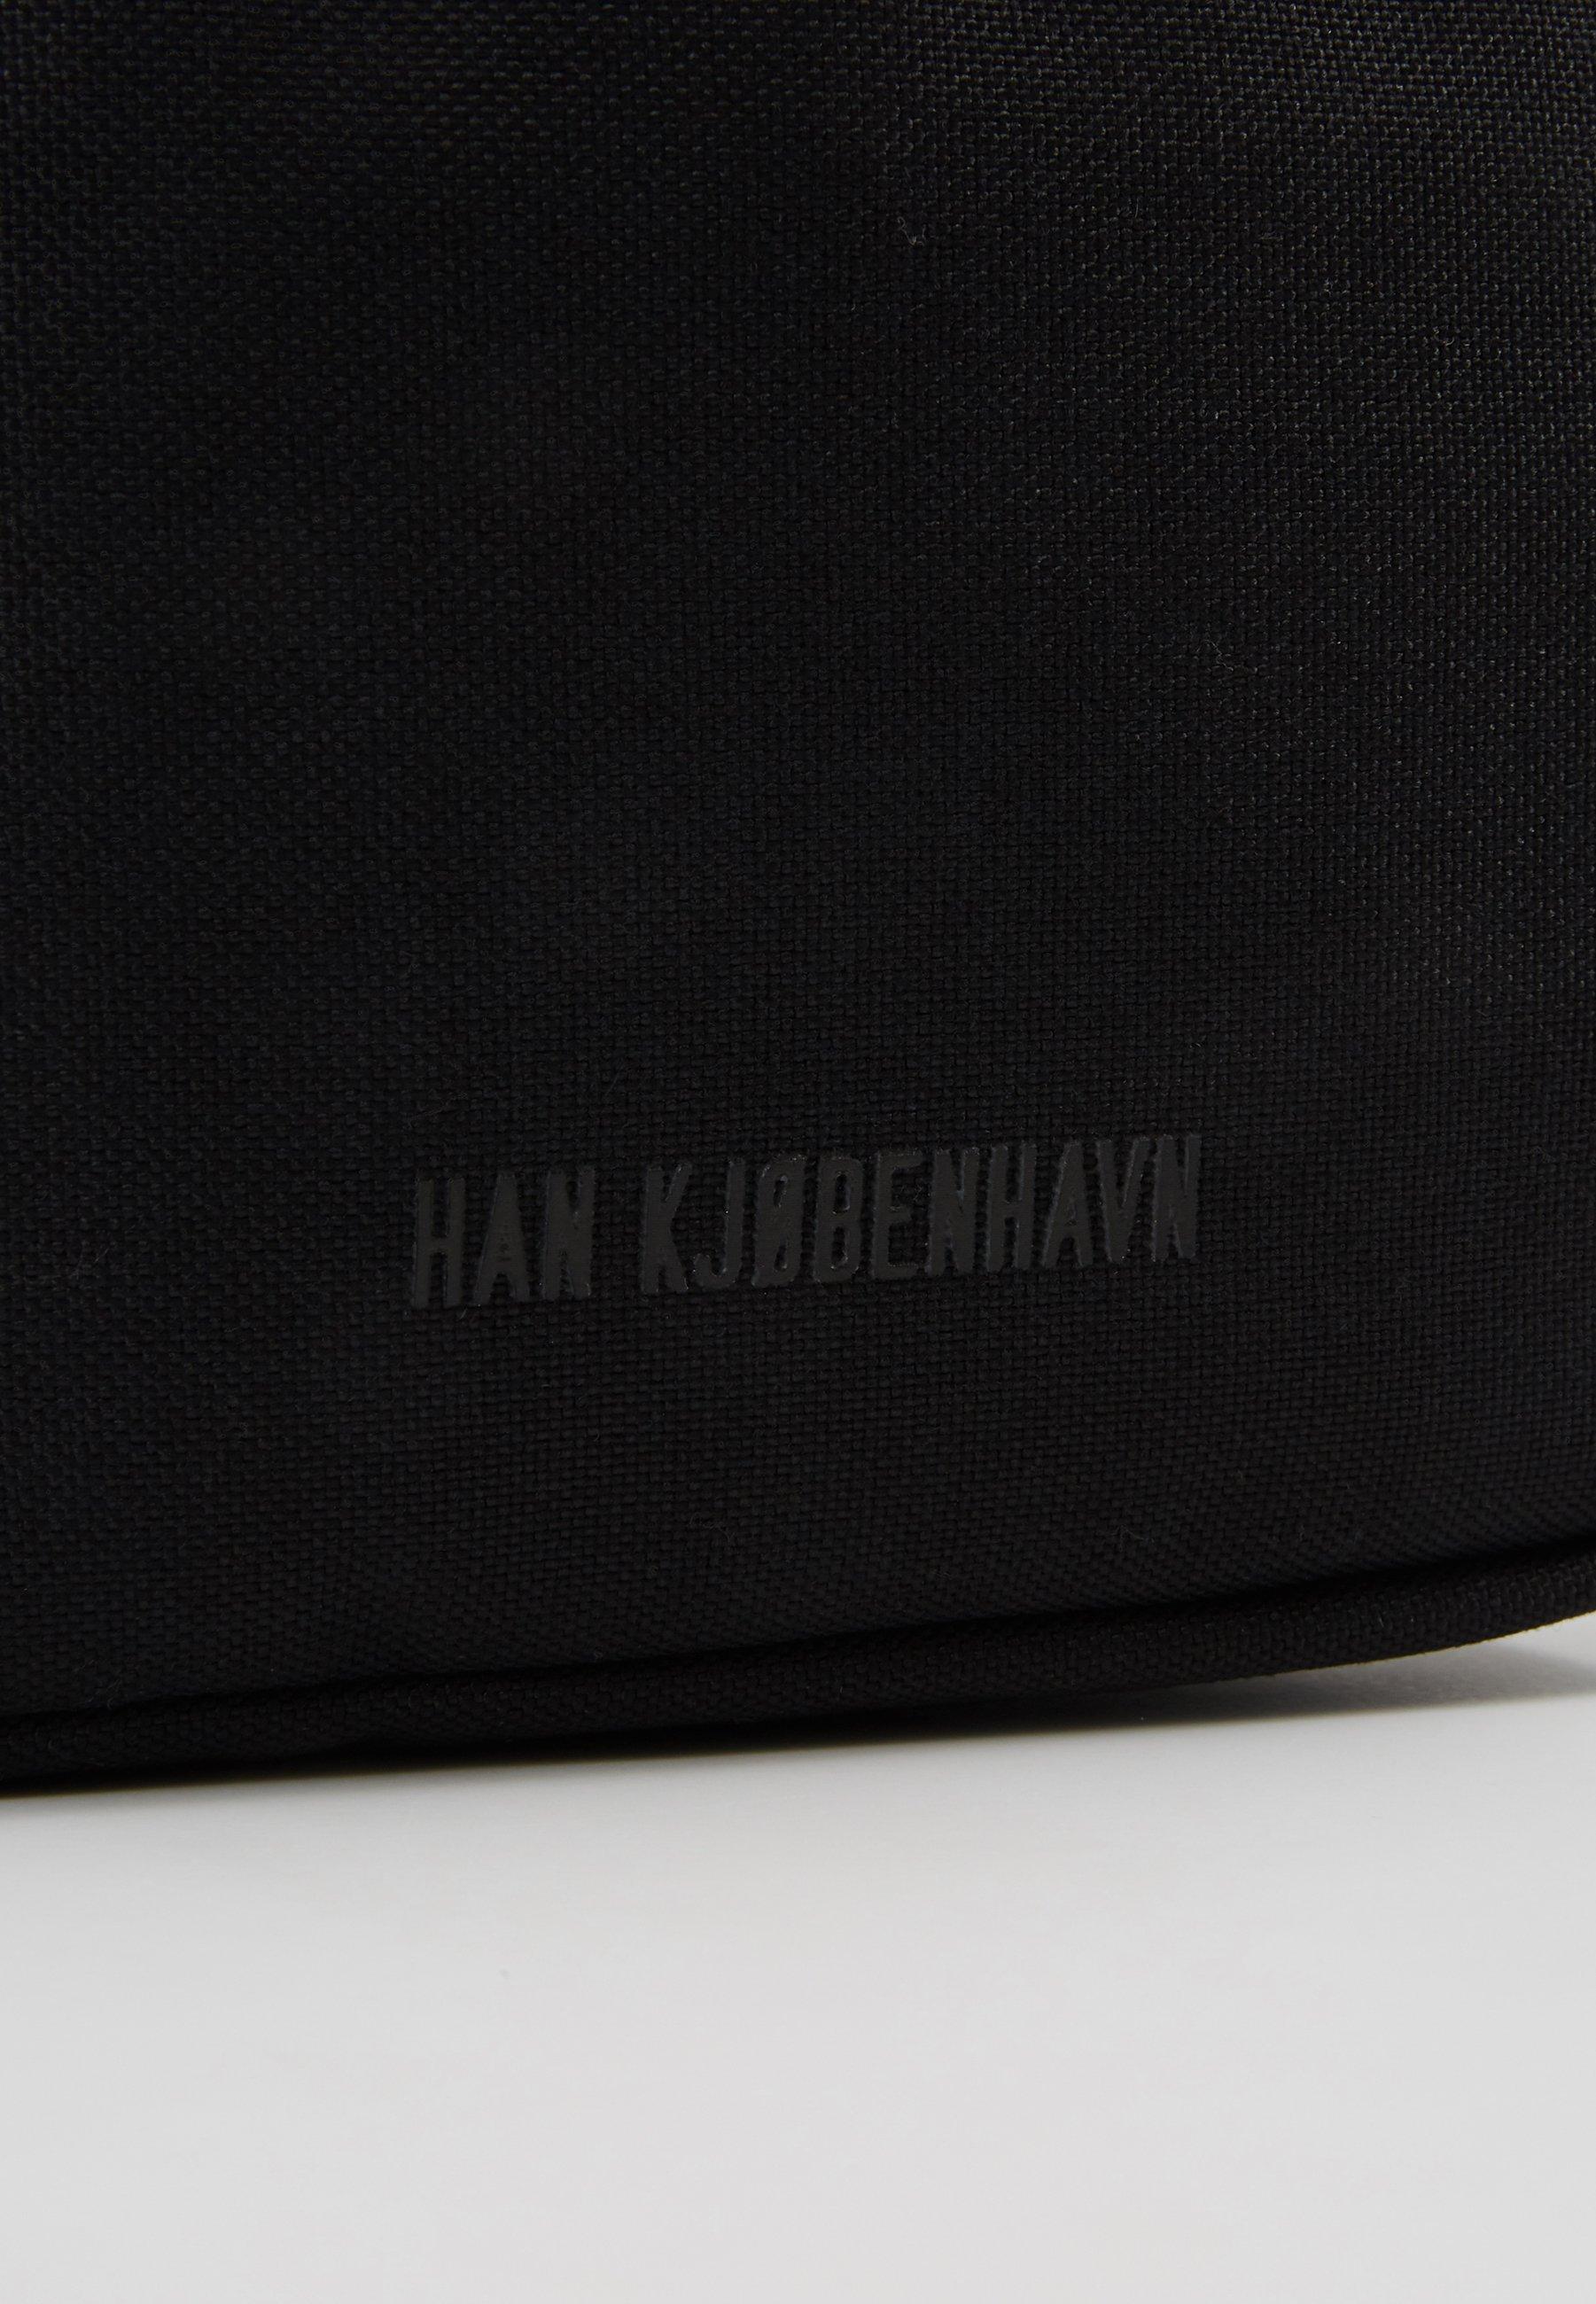 Han Kjobenhavn Triangle Bag - Sac Bandoulière Black